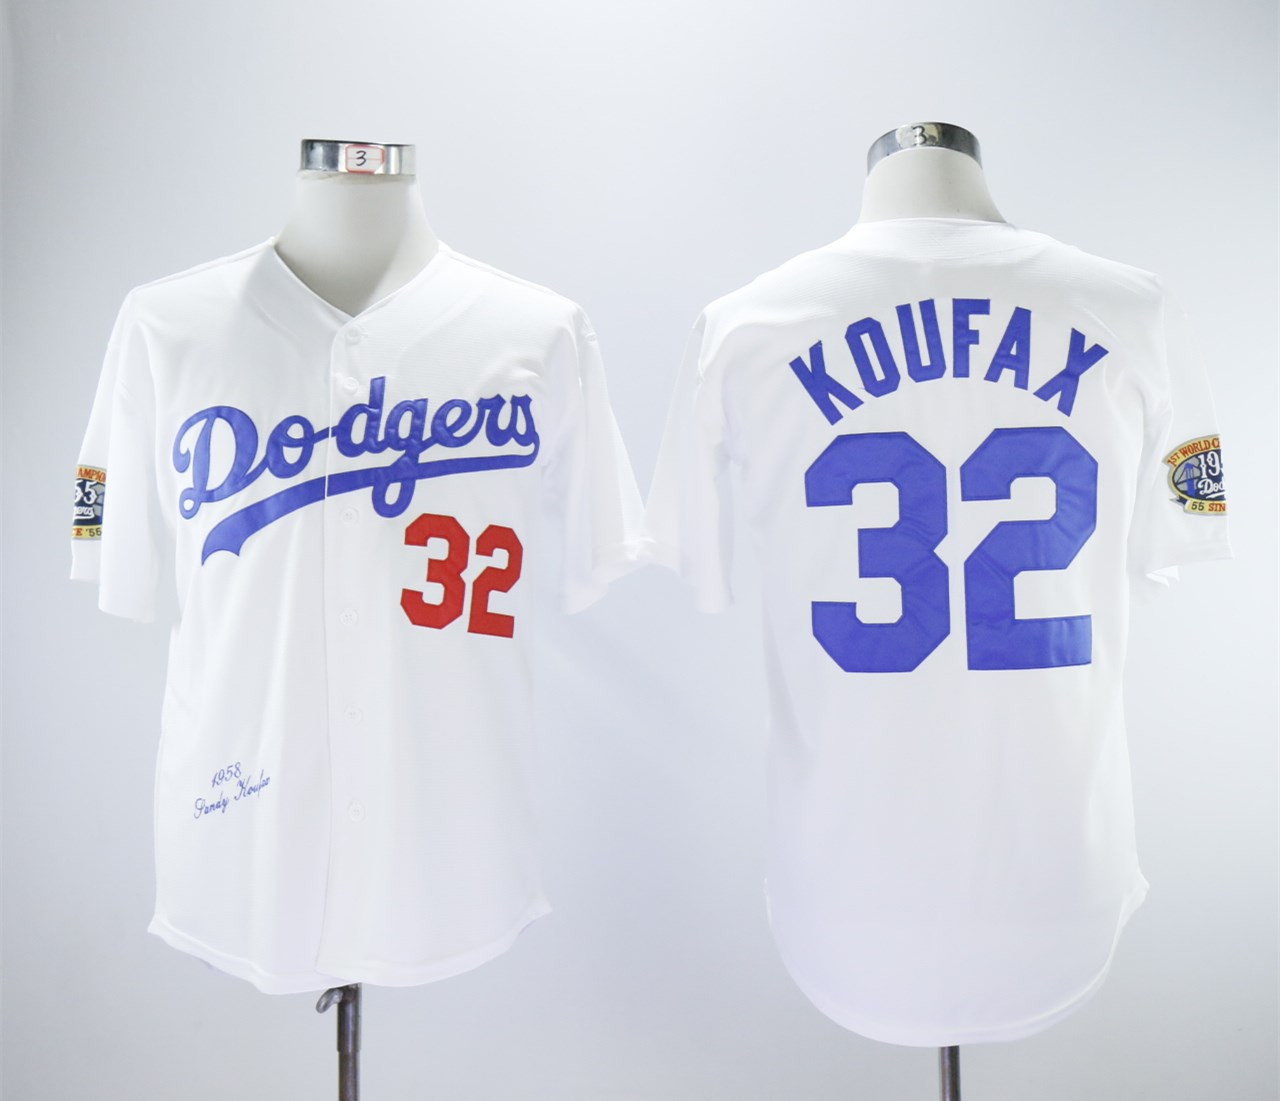 Dodgers 32 Sandy Koufax White 1958 Throwback Jersey